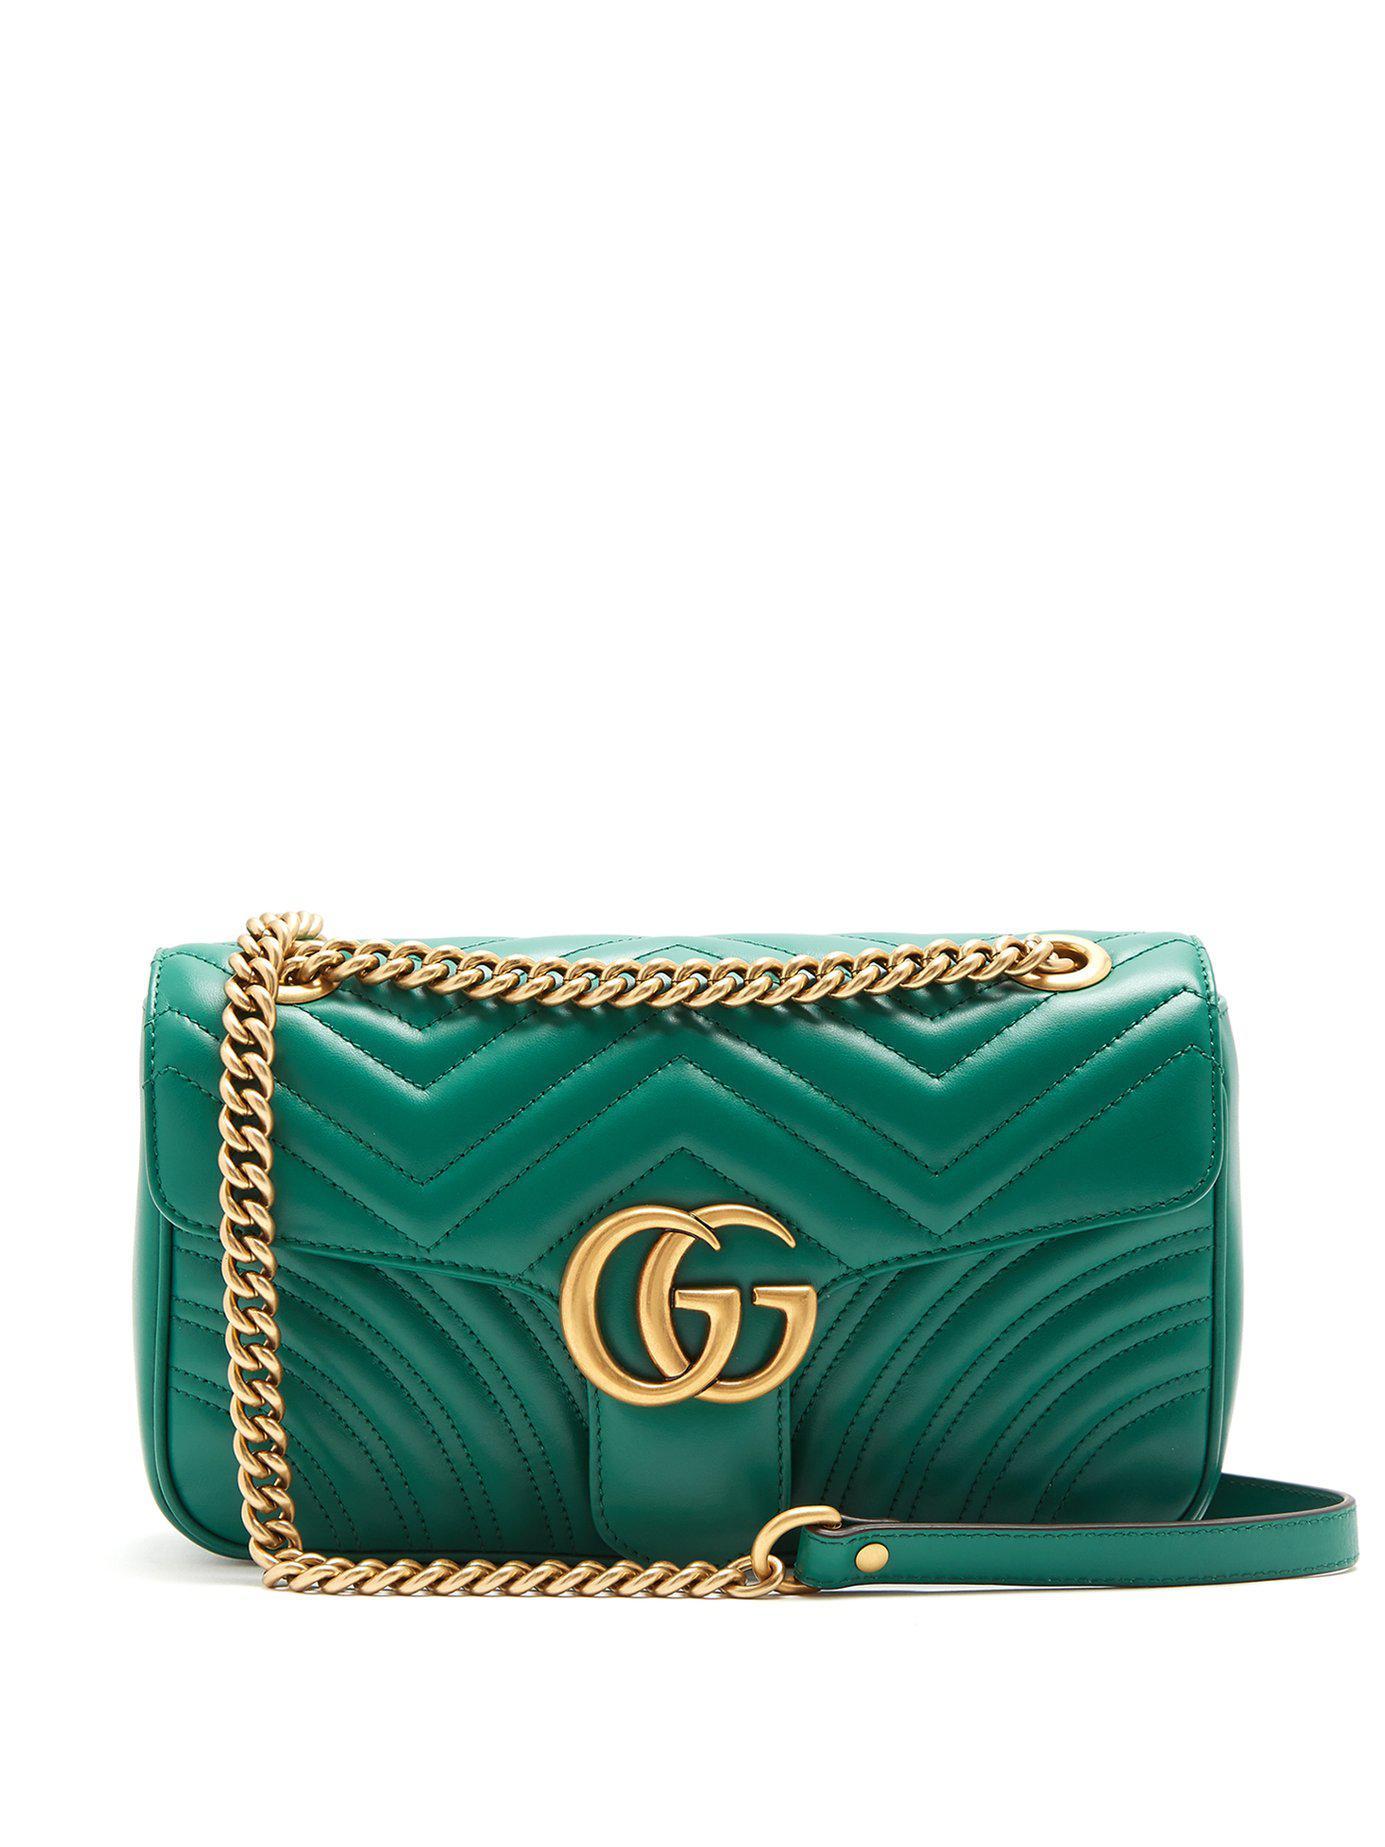 4a2742efa1f989 Gucci Women's GG Marmont Matelassé Mini Bag - Red in Green - Save 10 ...